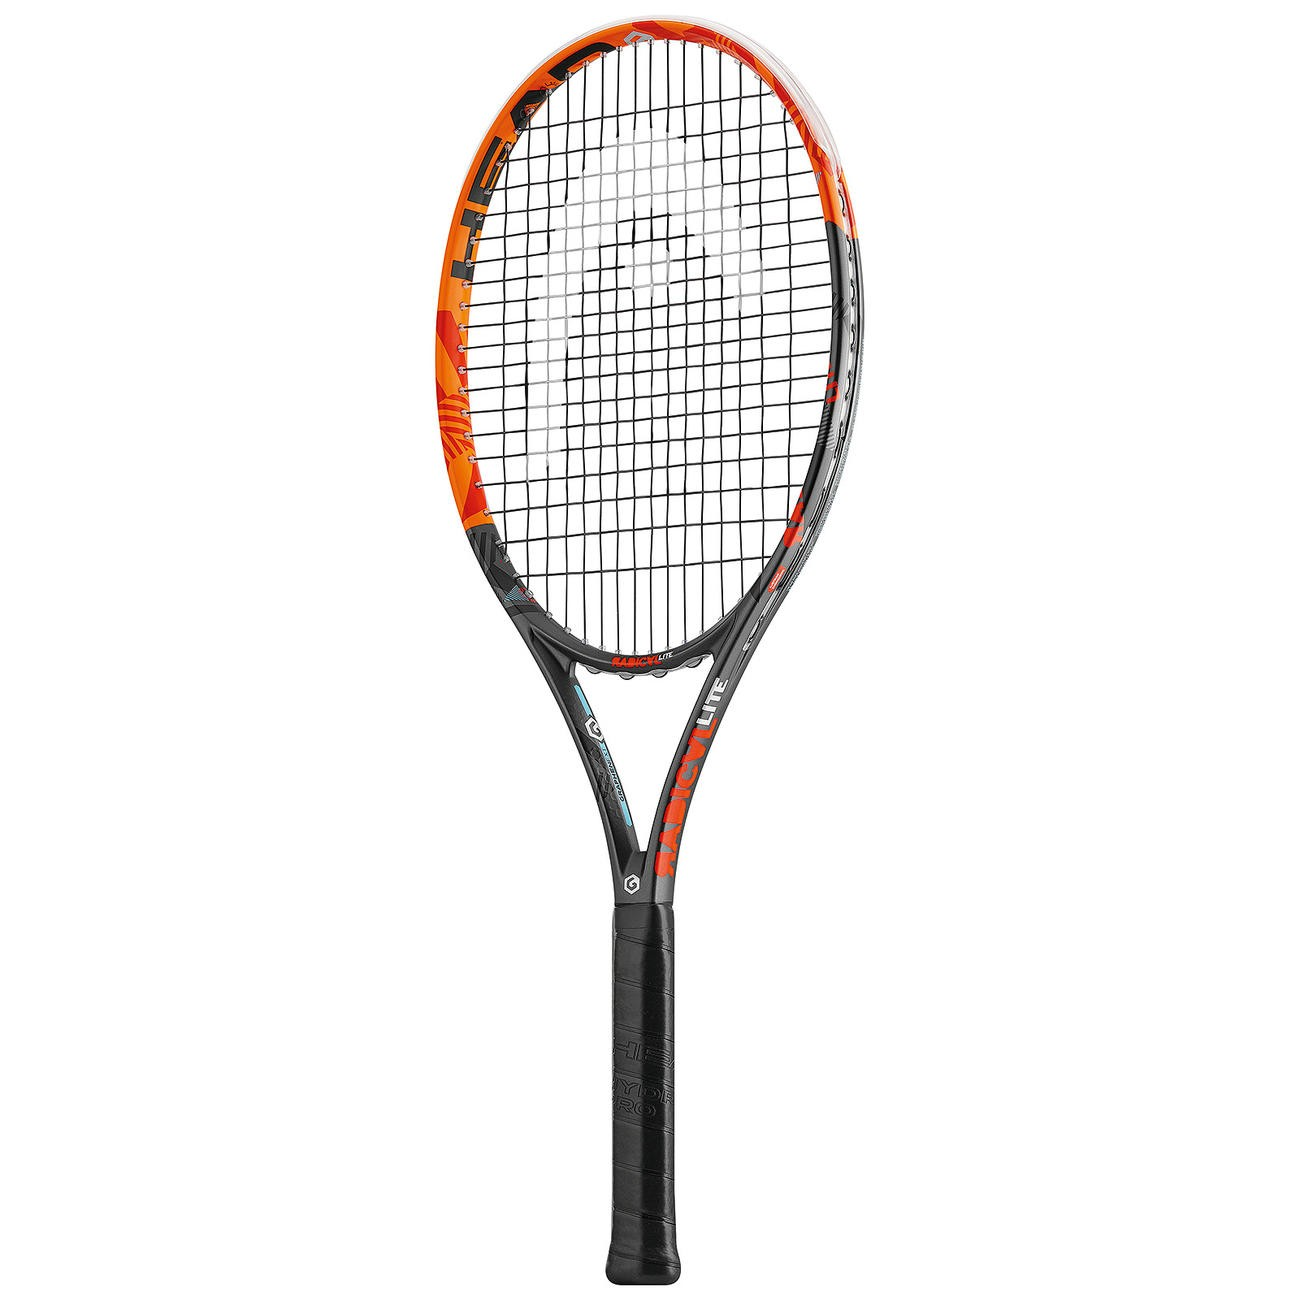 Rakieta tenisowa Head Graphene XT Radical Lite